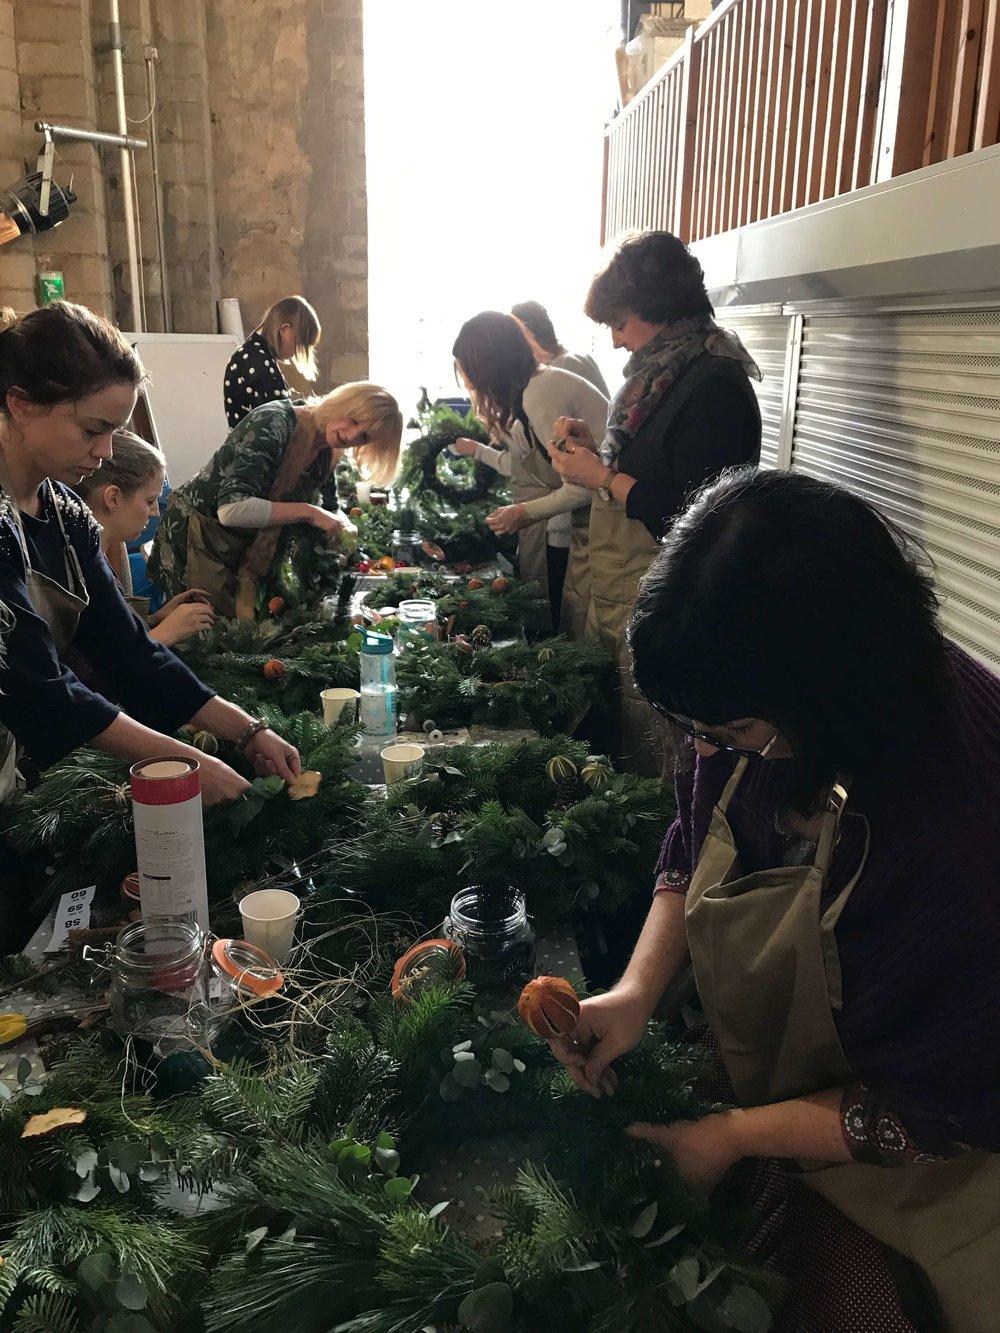 Christmas Wreath Making Workshop Ely Cambridgeshire 2nd December (2).jpg